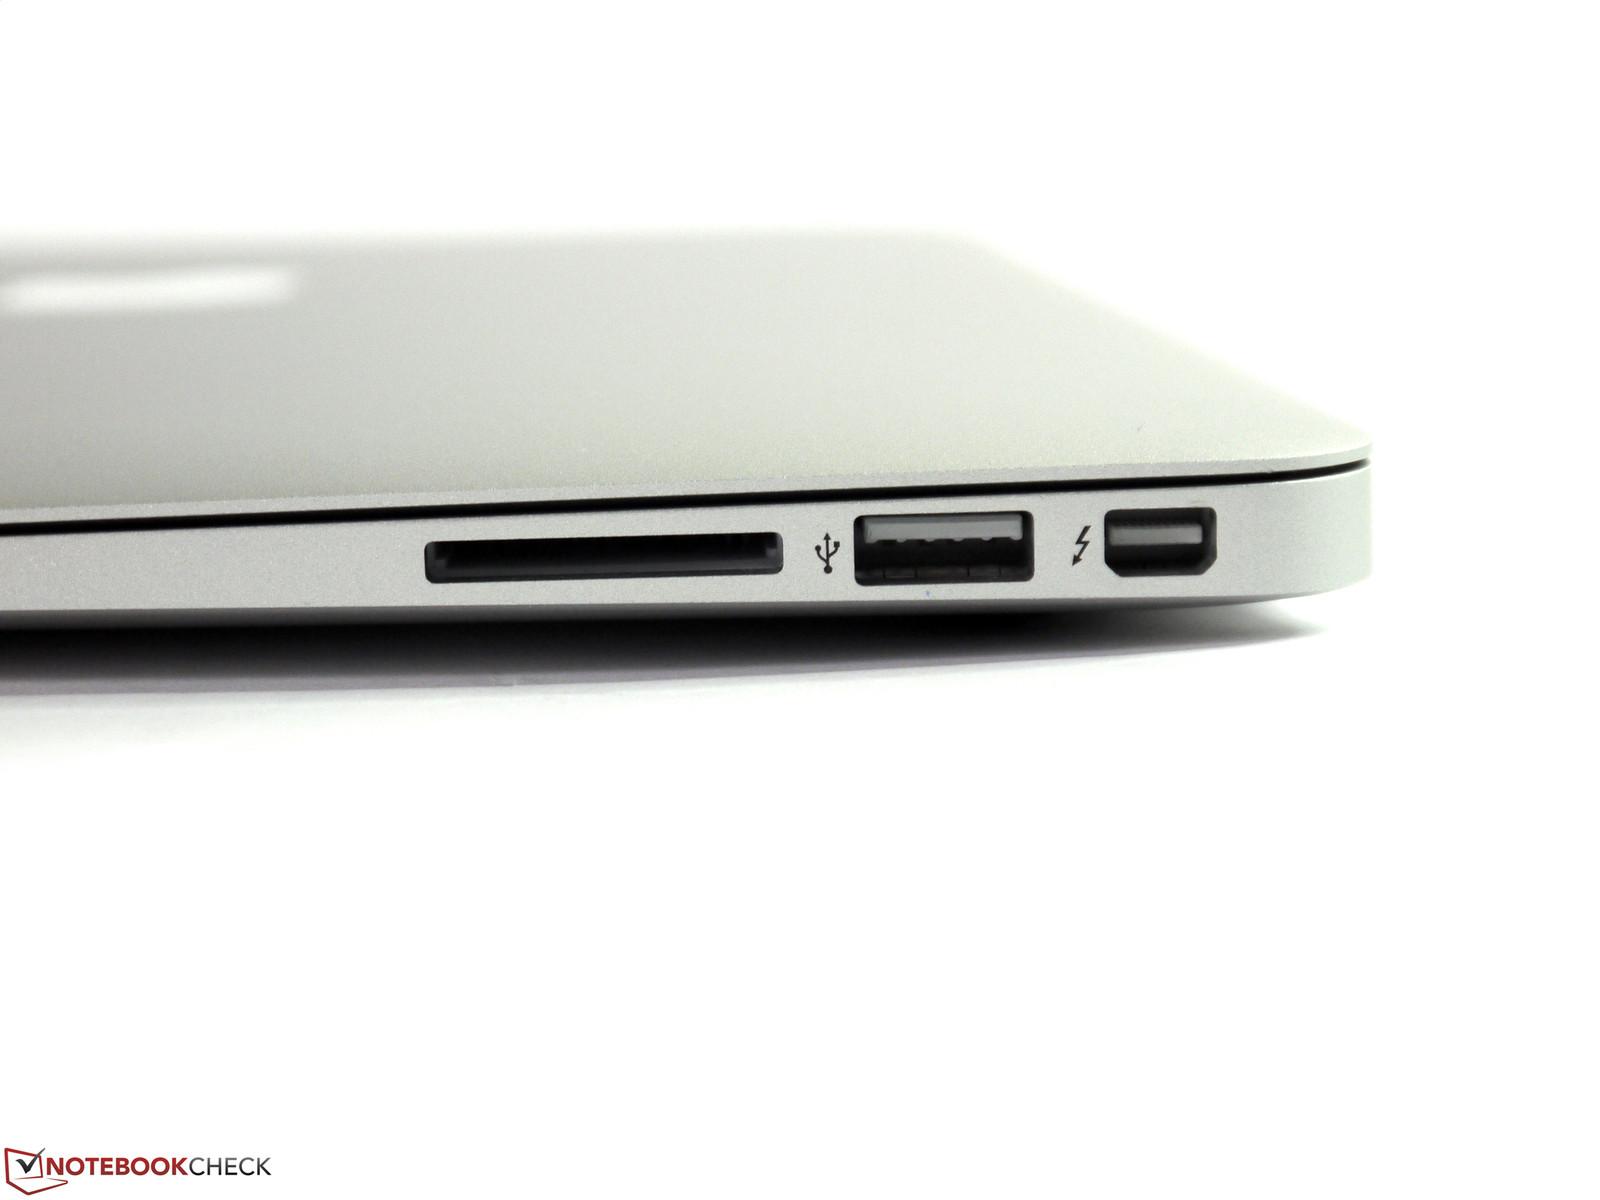 Apple MacBook Air 13 (2015) Notebook Review - NotebookCheck